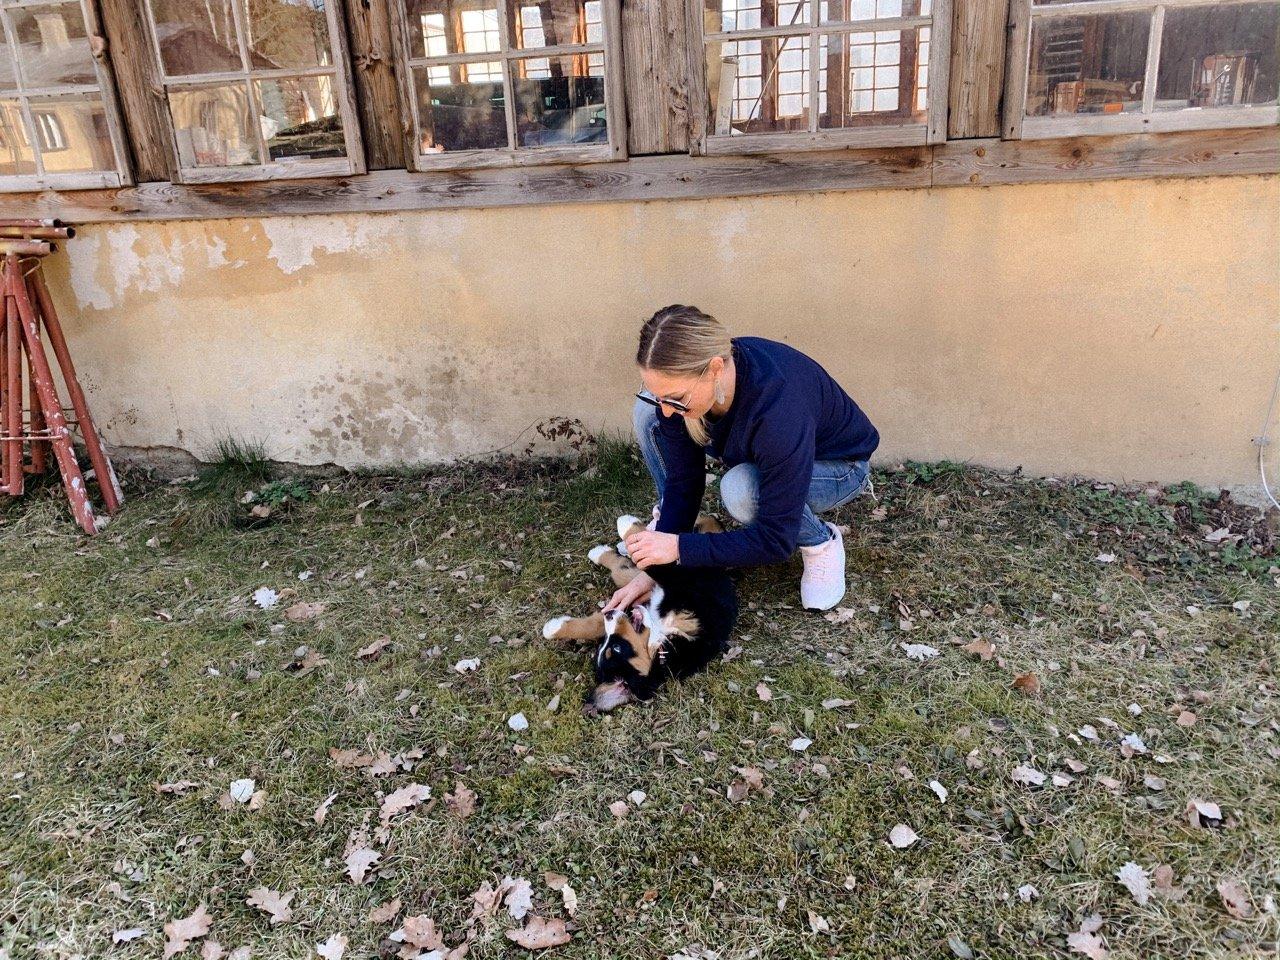 Hund und Kind was muss beachtet werden? MamaWahnsinn